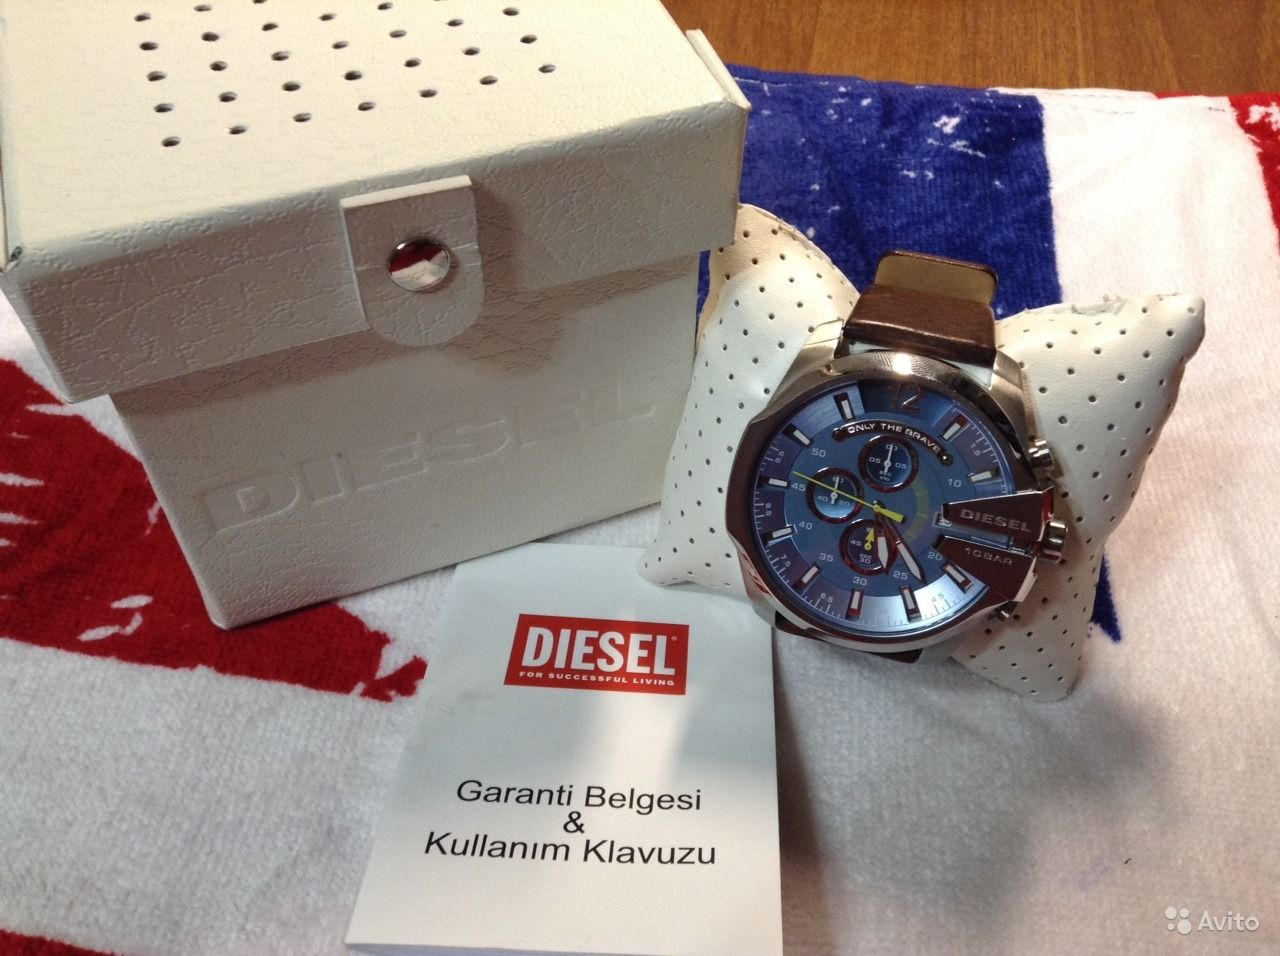 Часы Diesel DZ7111 Iron Man Хищник оригинал!